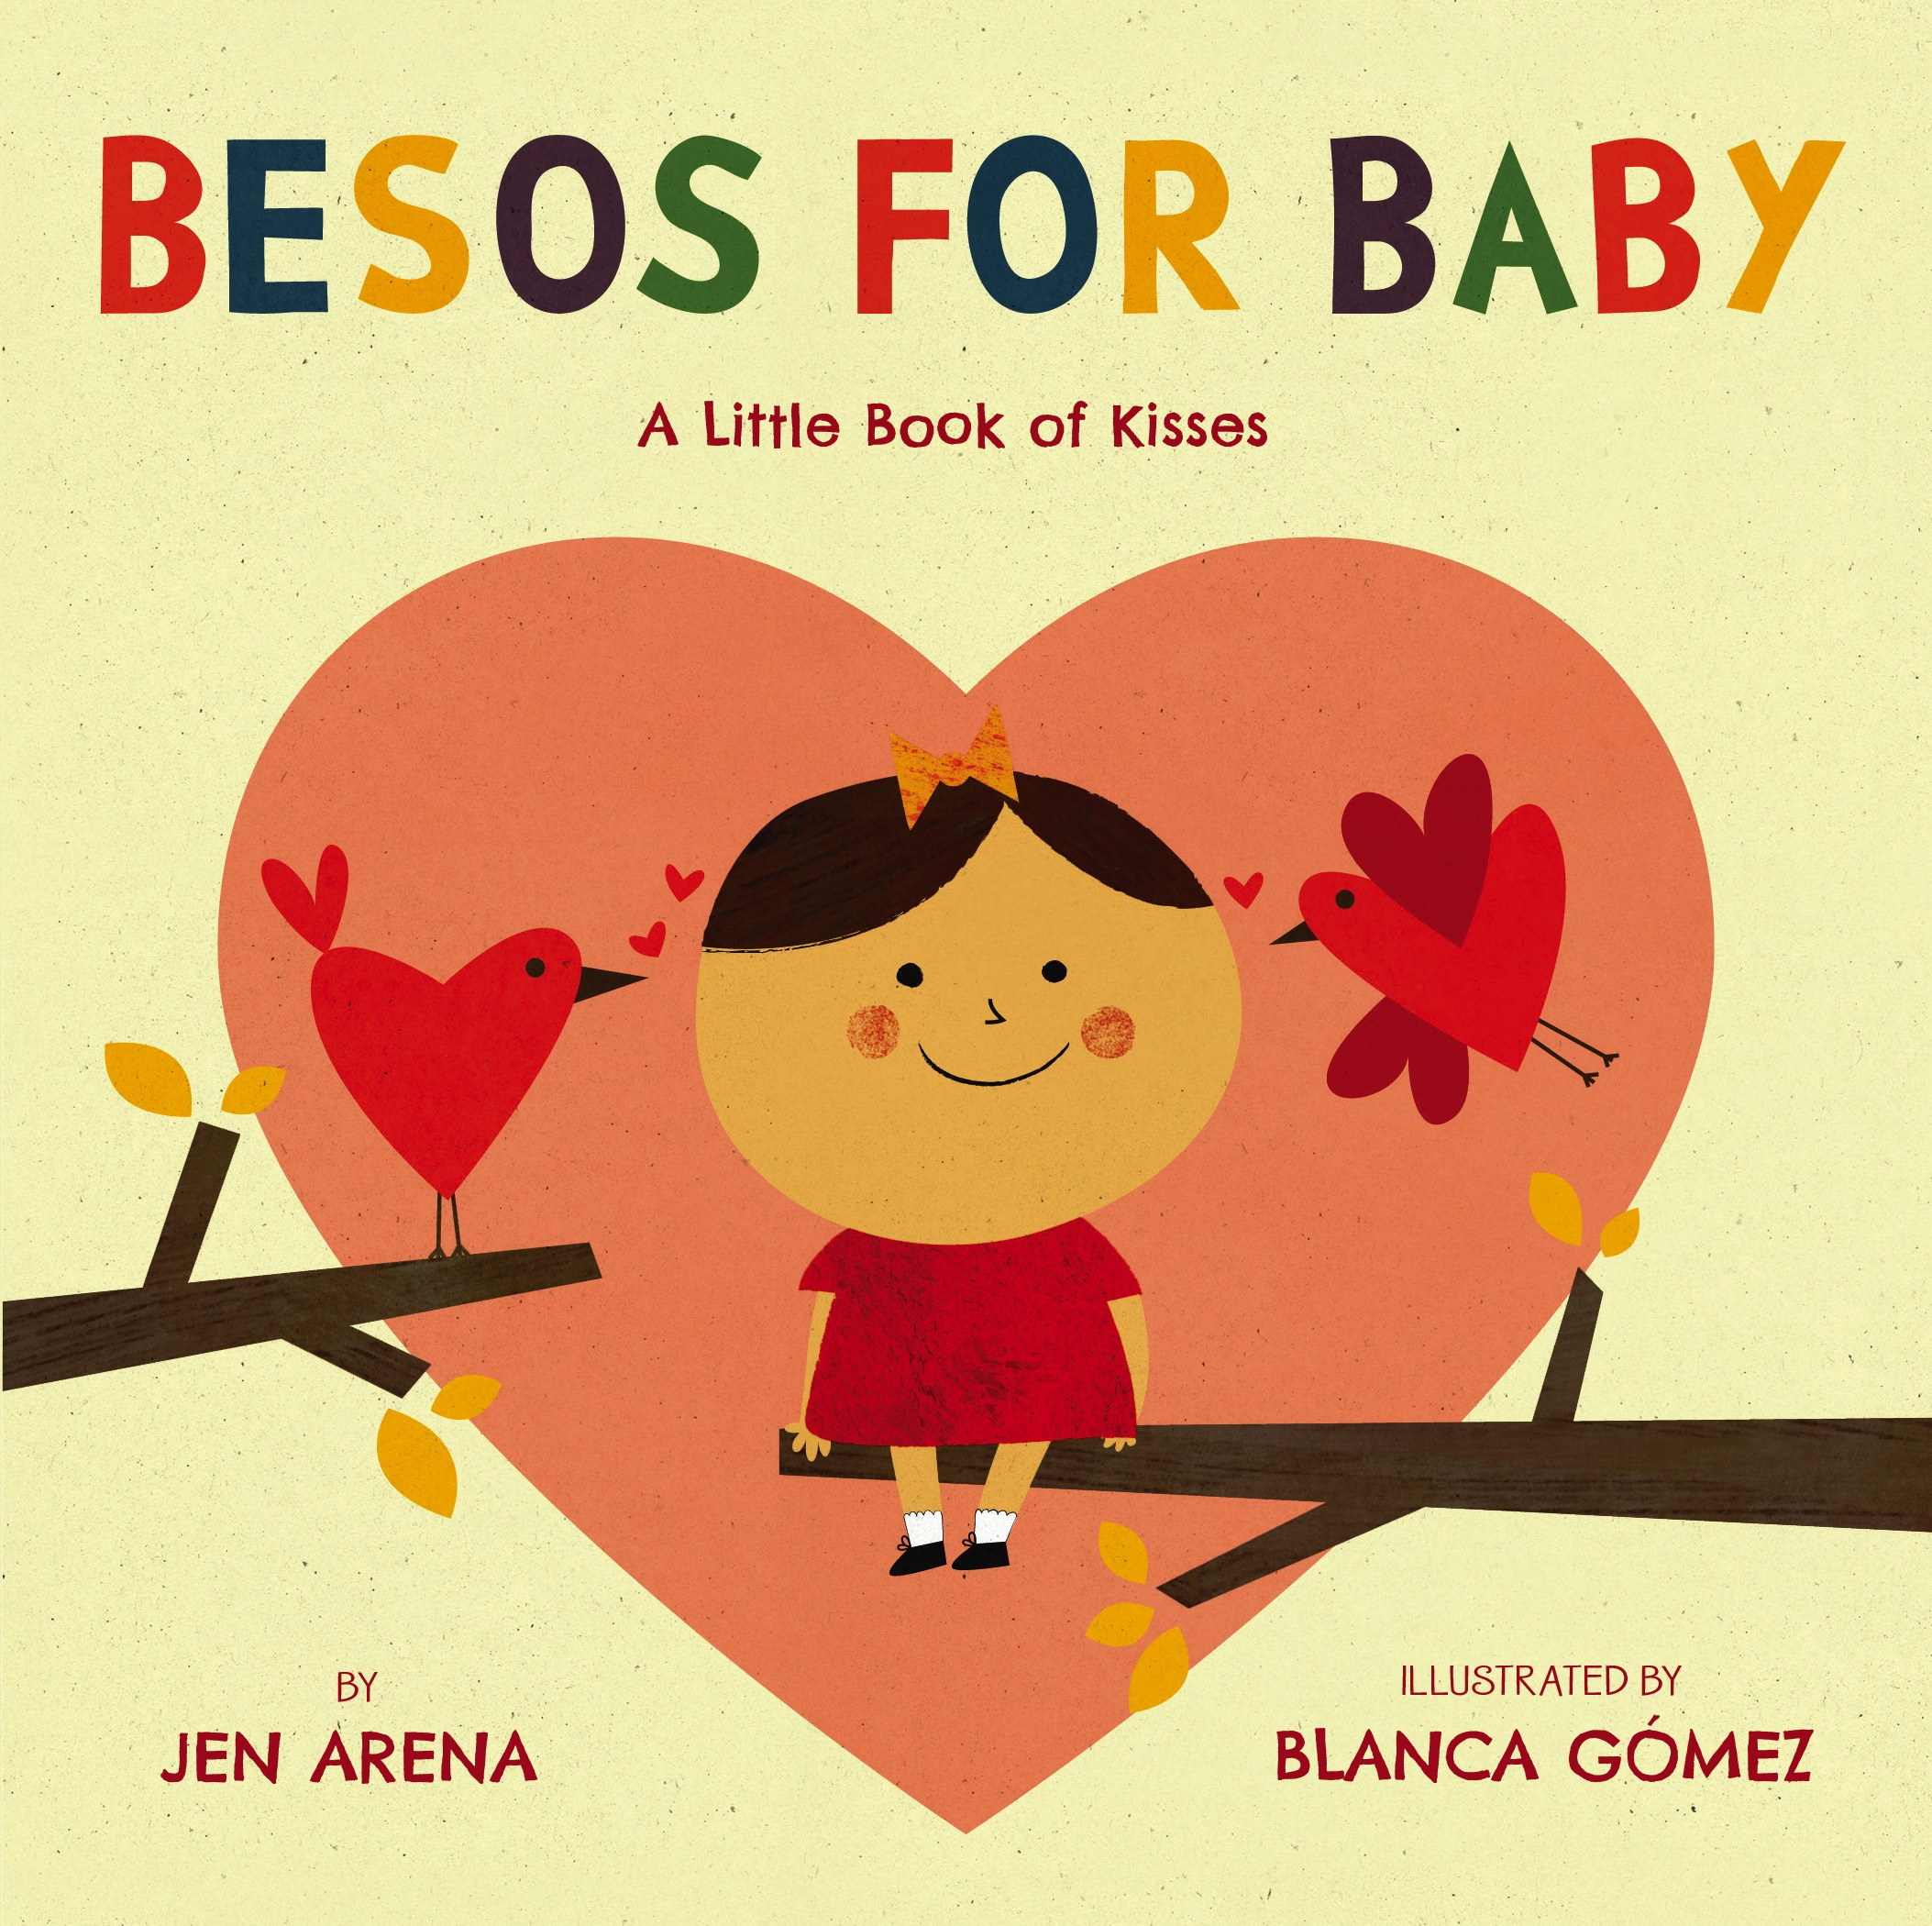 A sweet bilingual board book of kisses.